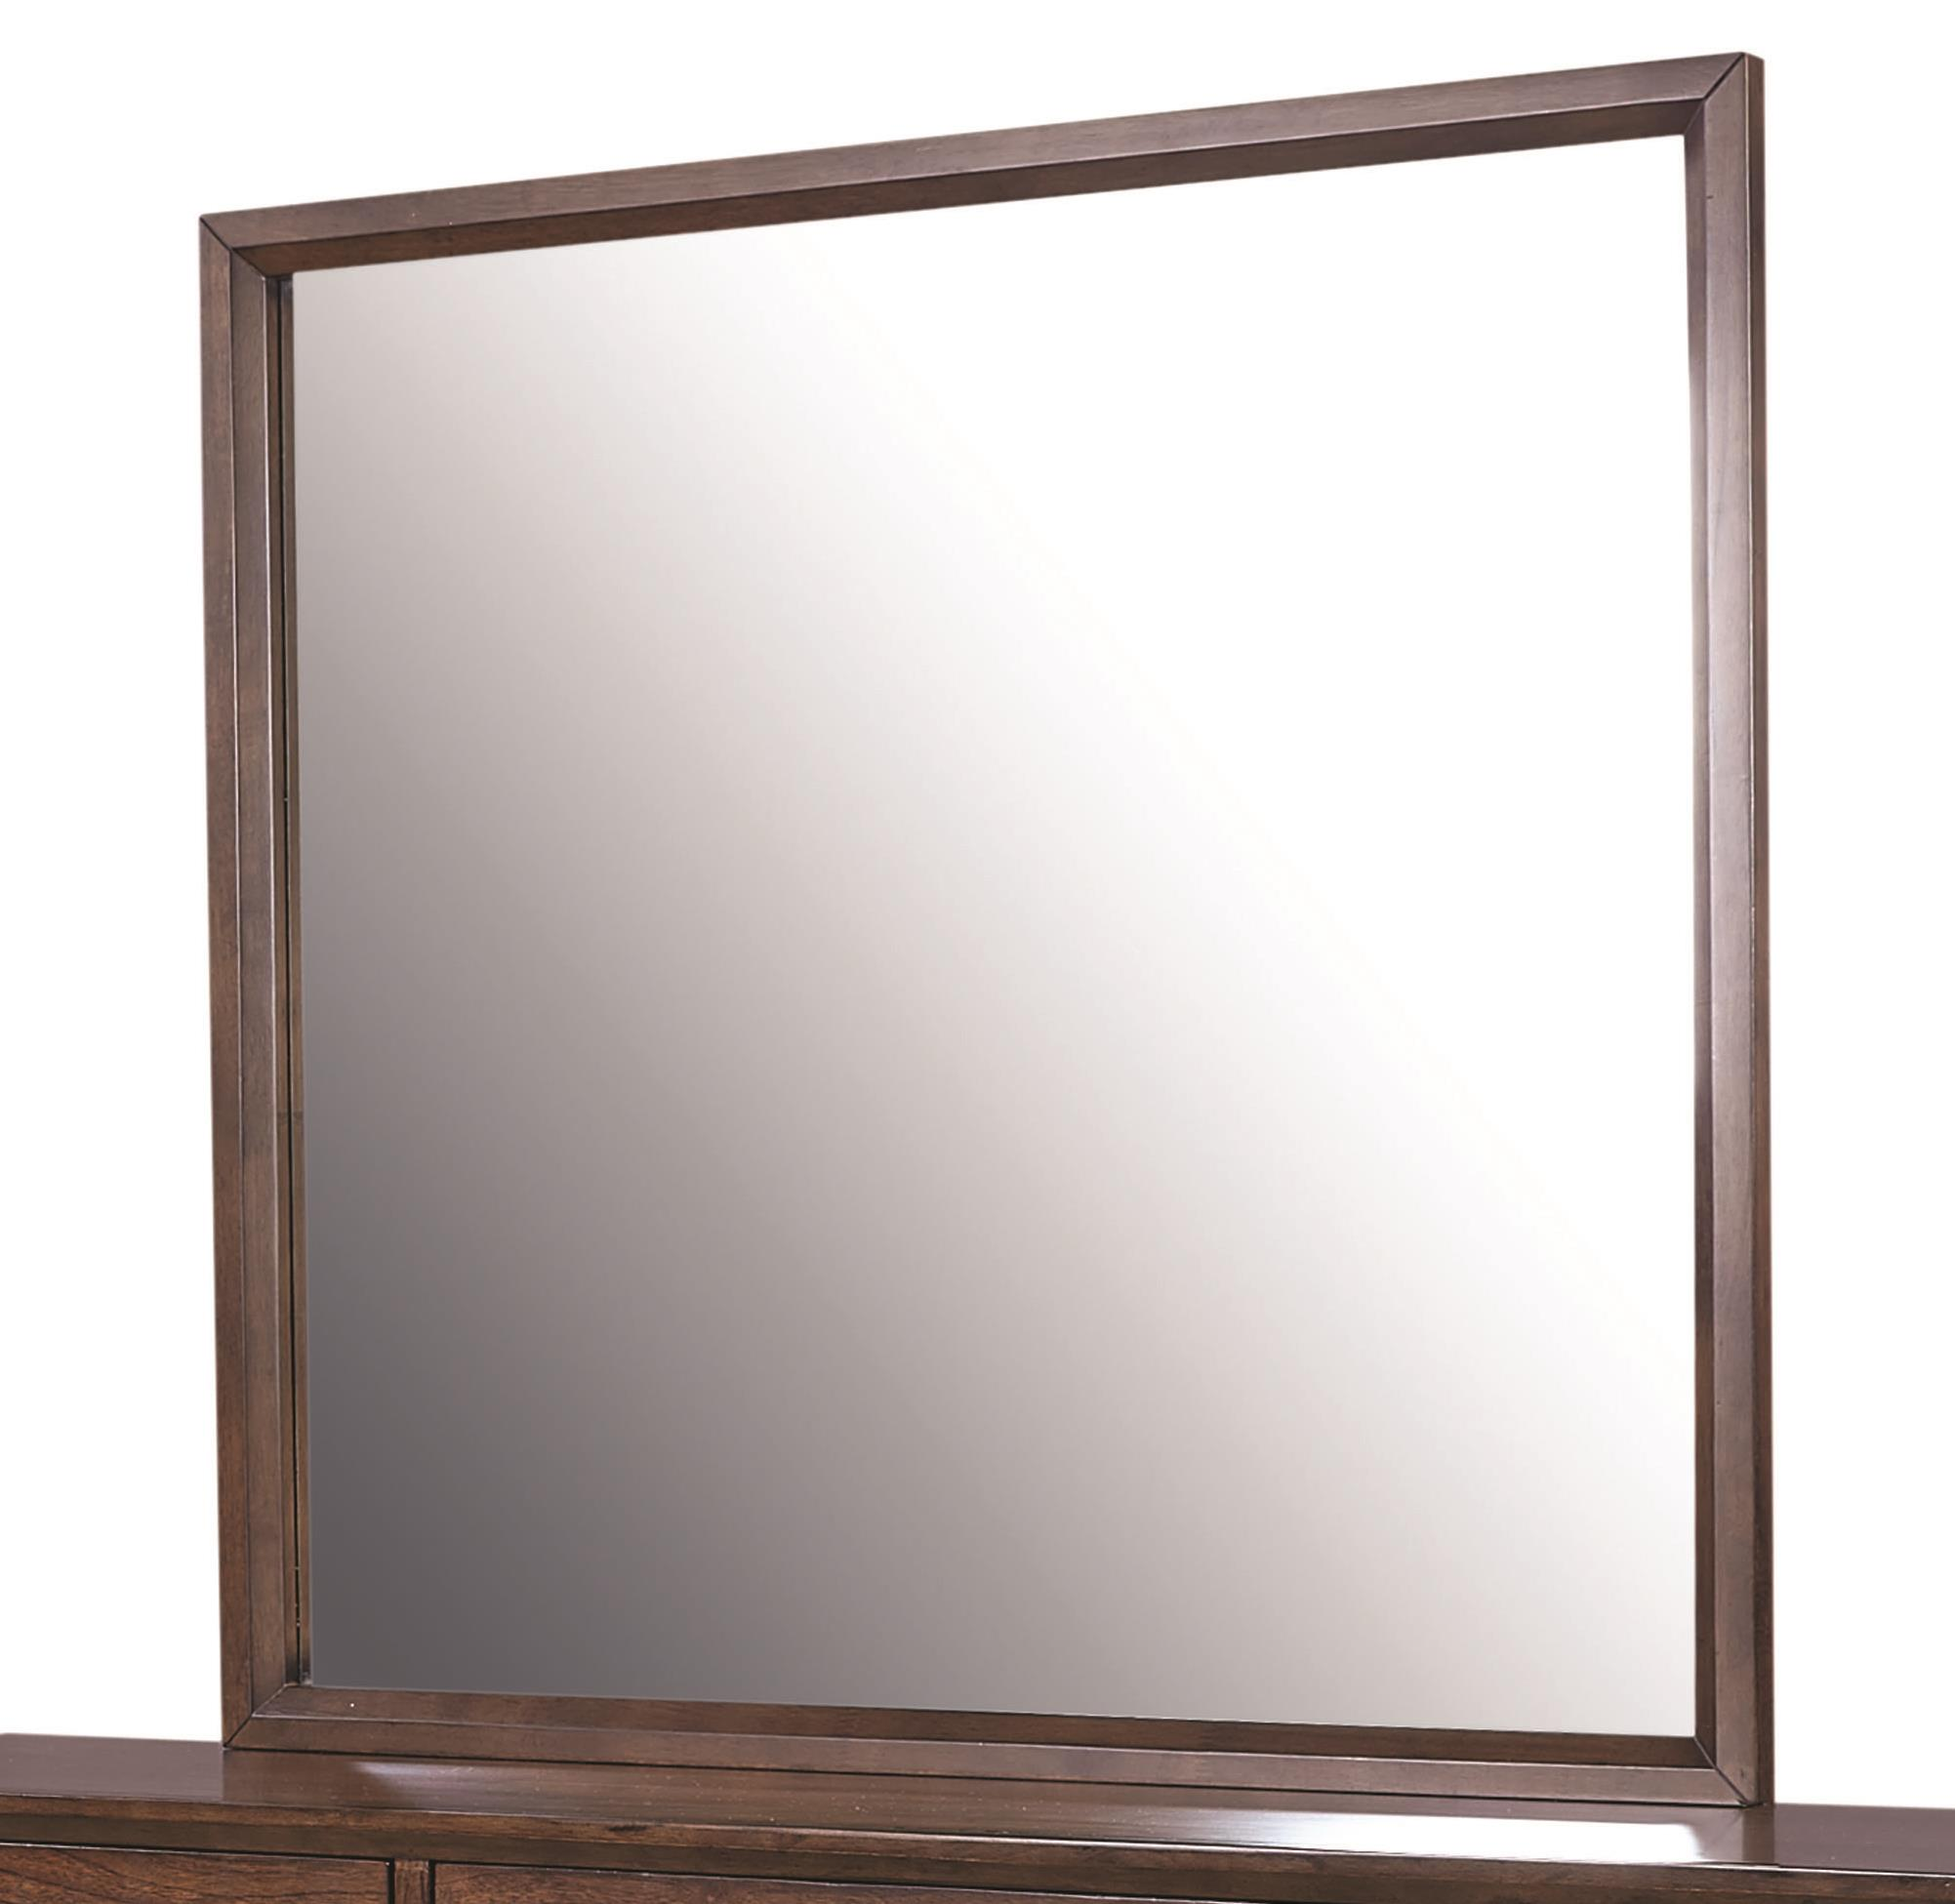 Aspenhome Walnut Heights Mirror  - Item Number: IWH-463